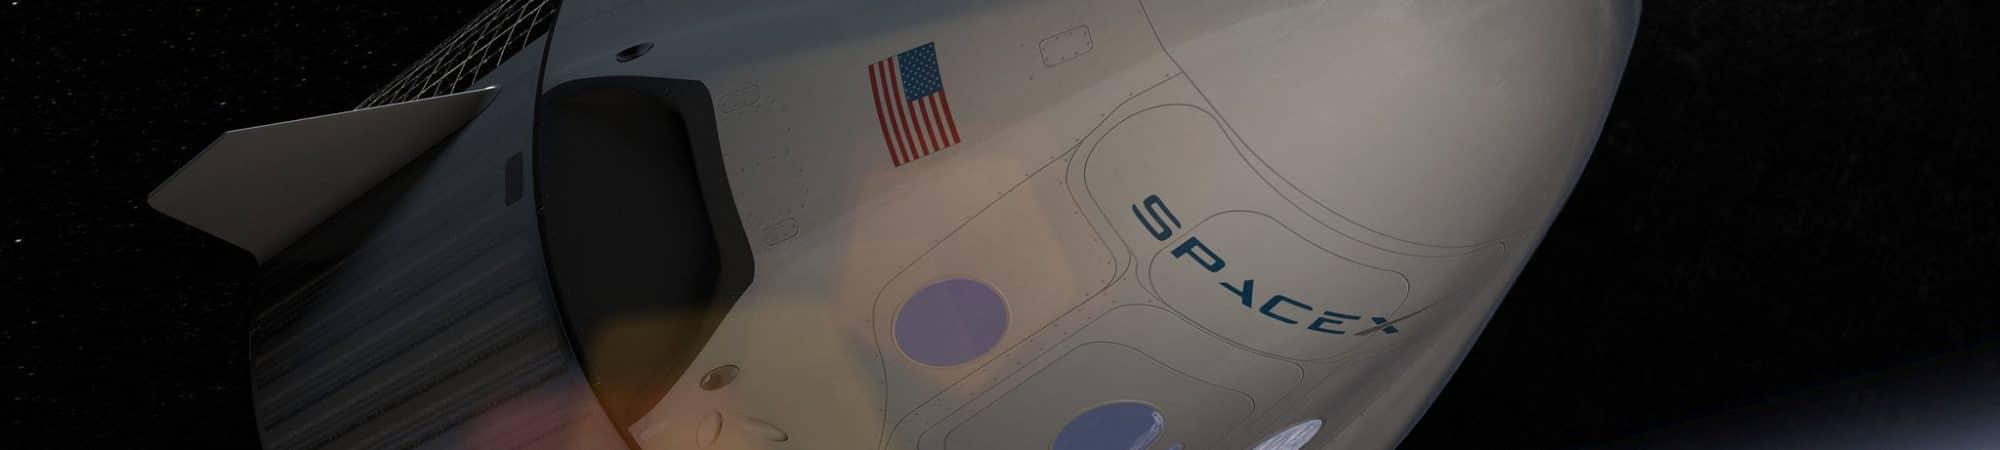 Cápsula Crew Dragon da SpaceX